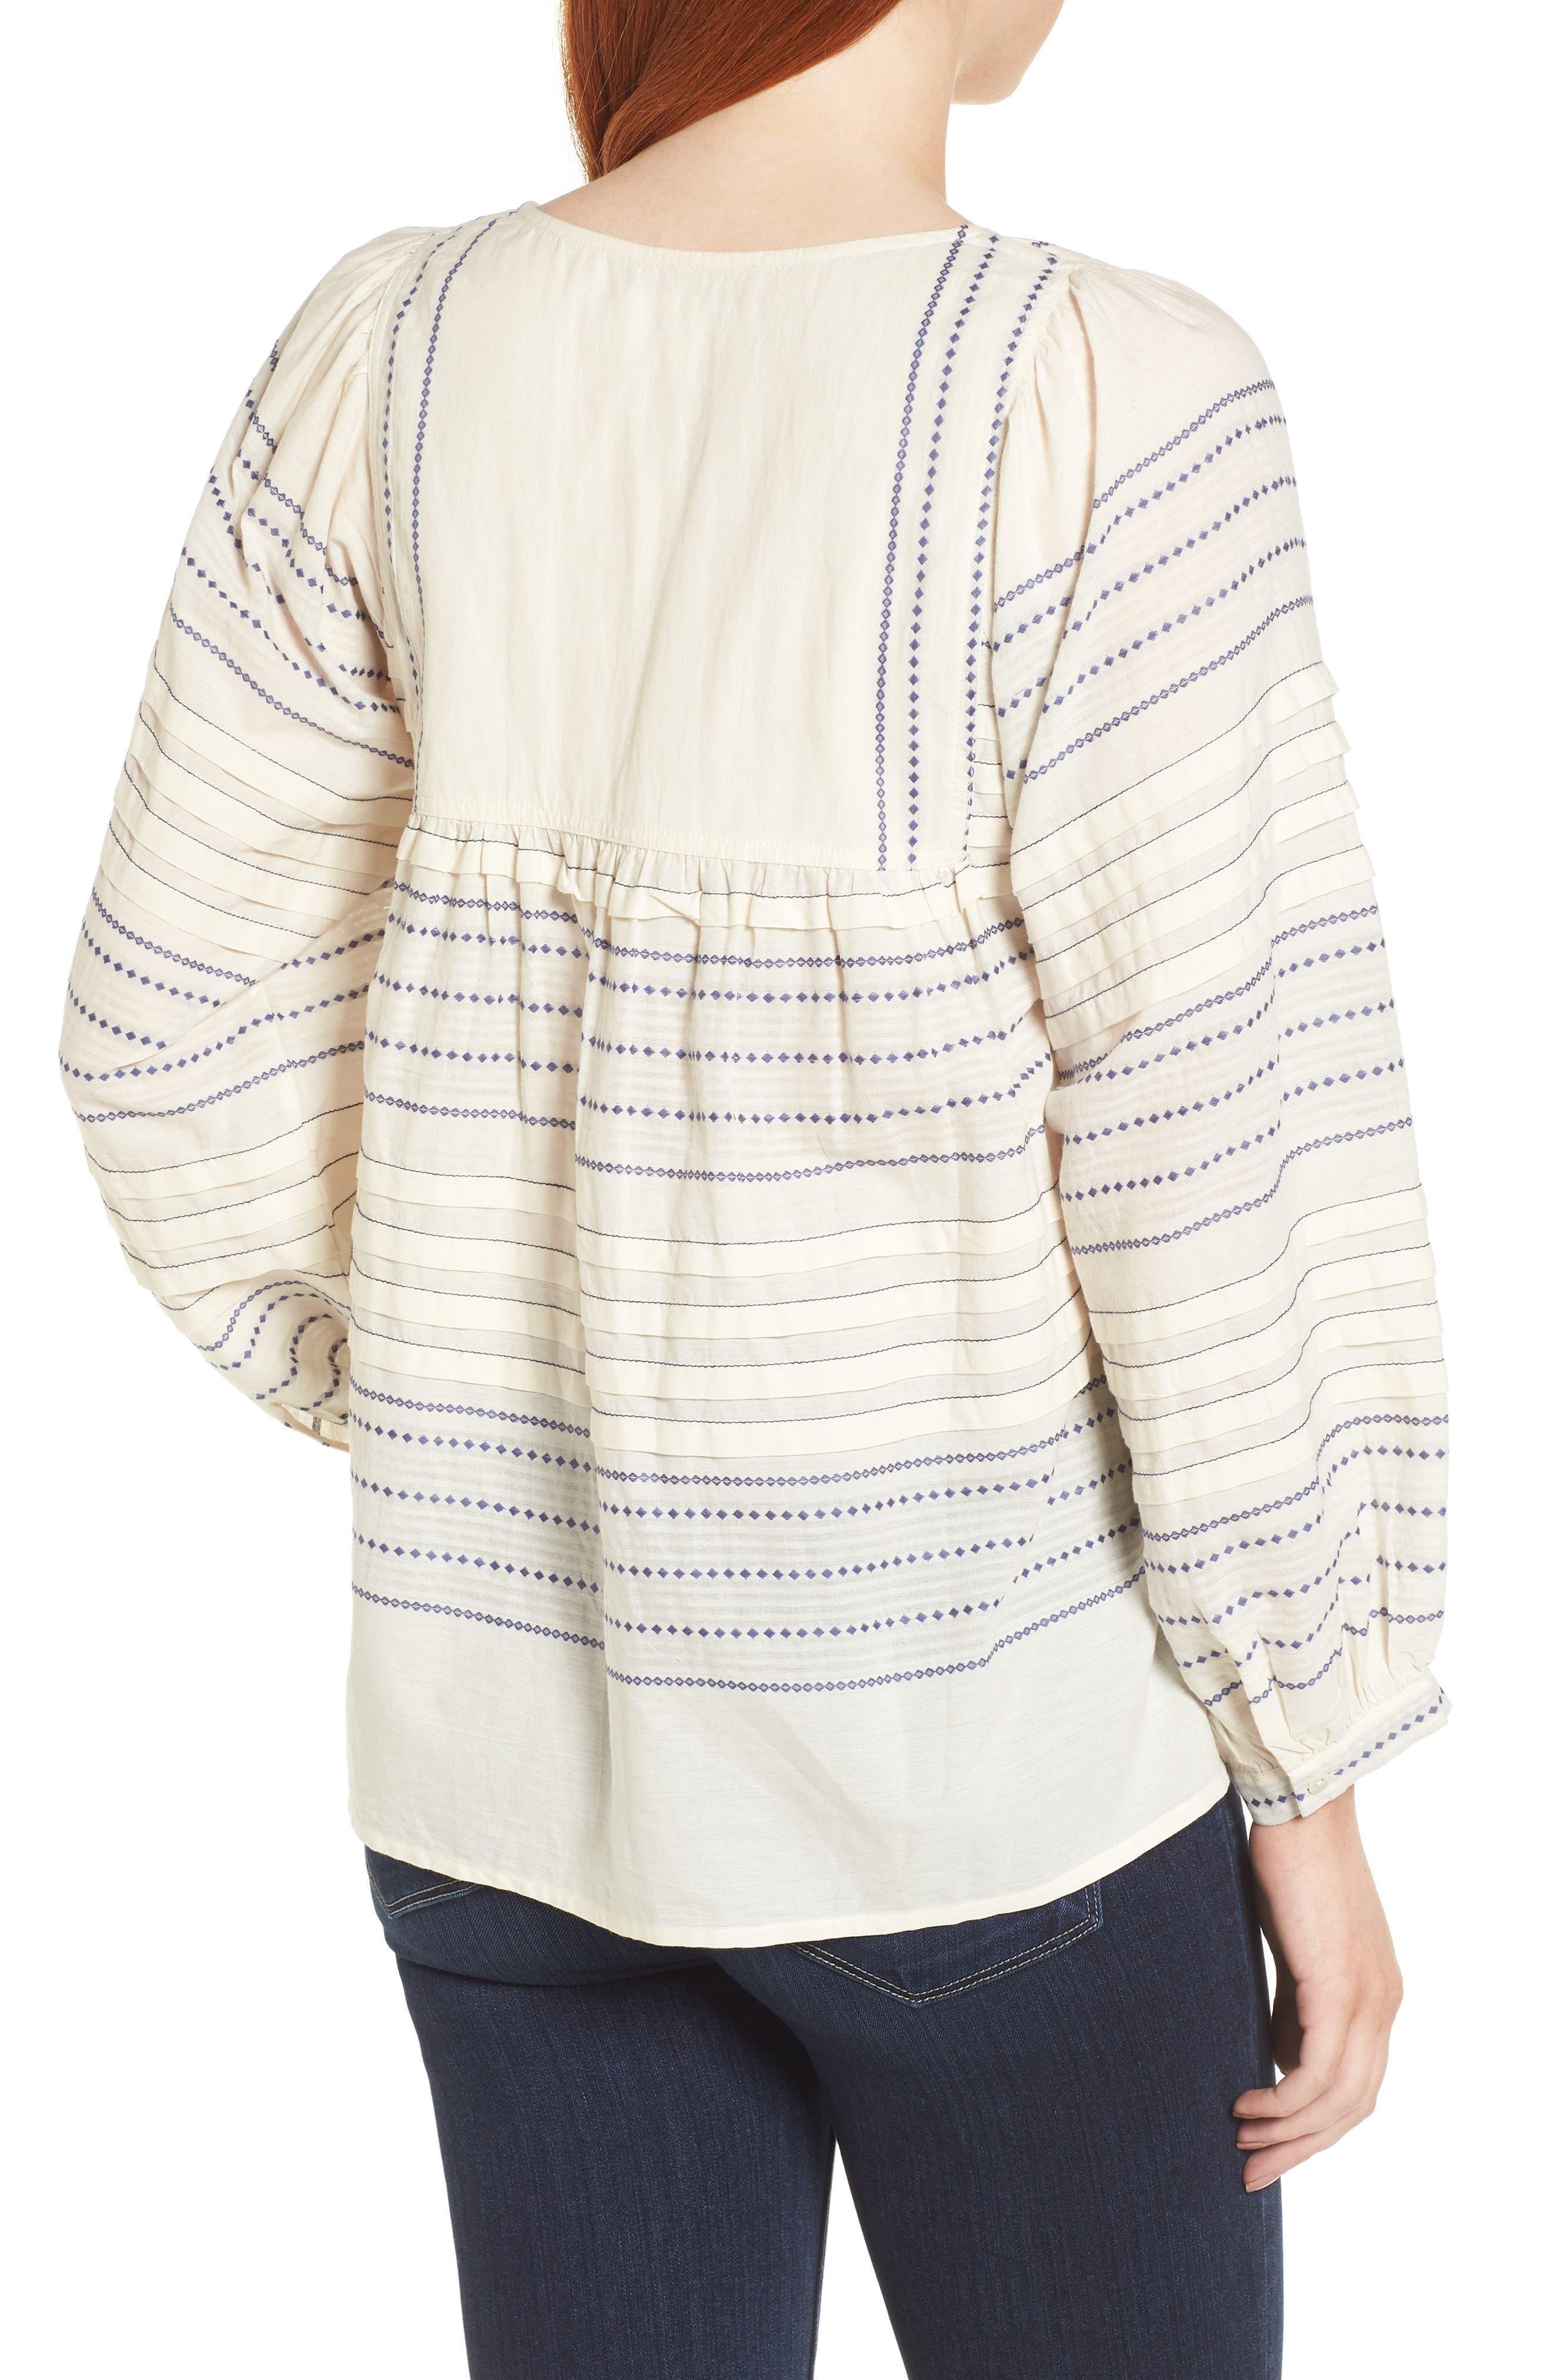 Paros Embroidered Cotton Peasant Blouse,                             Alternate thumbnail 2, color,                             906